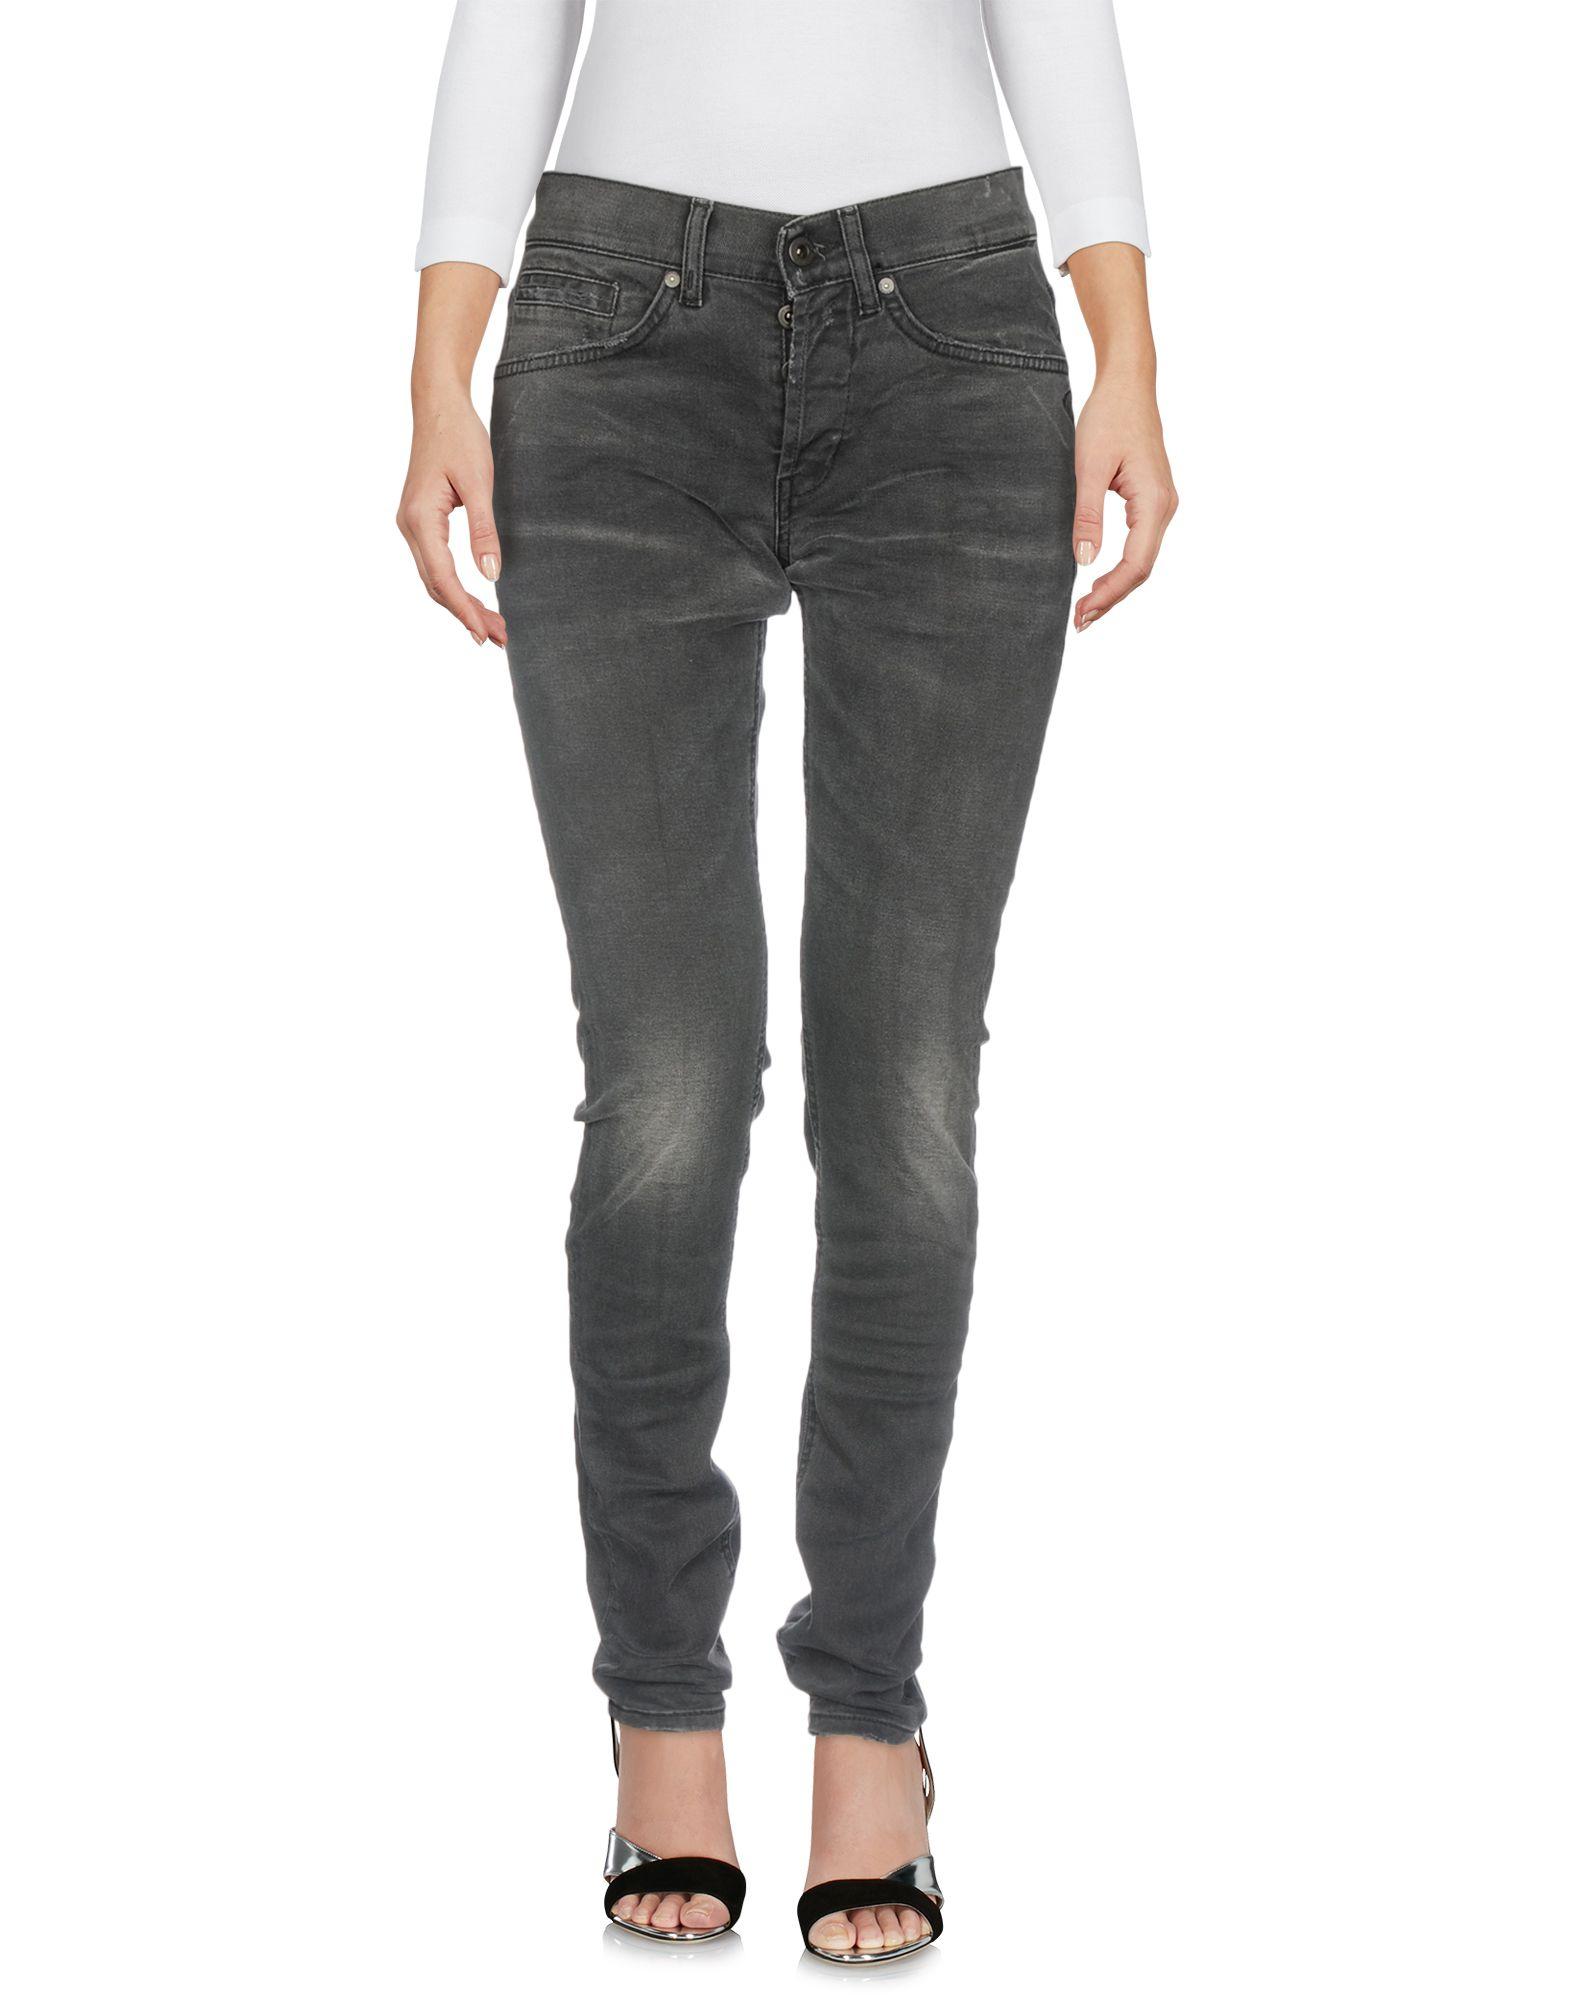 Pantaloni Jeans Dondup Donna - Acquista online su YA7Lz6u